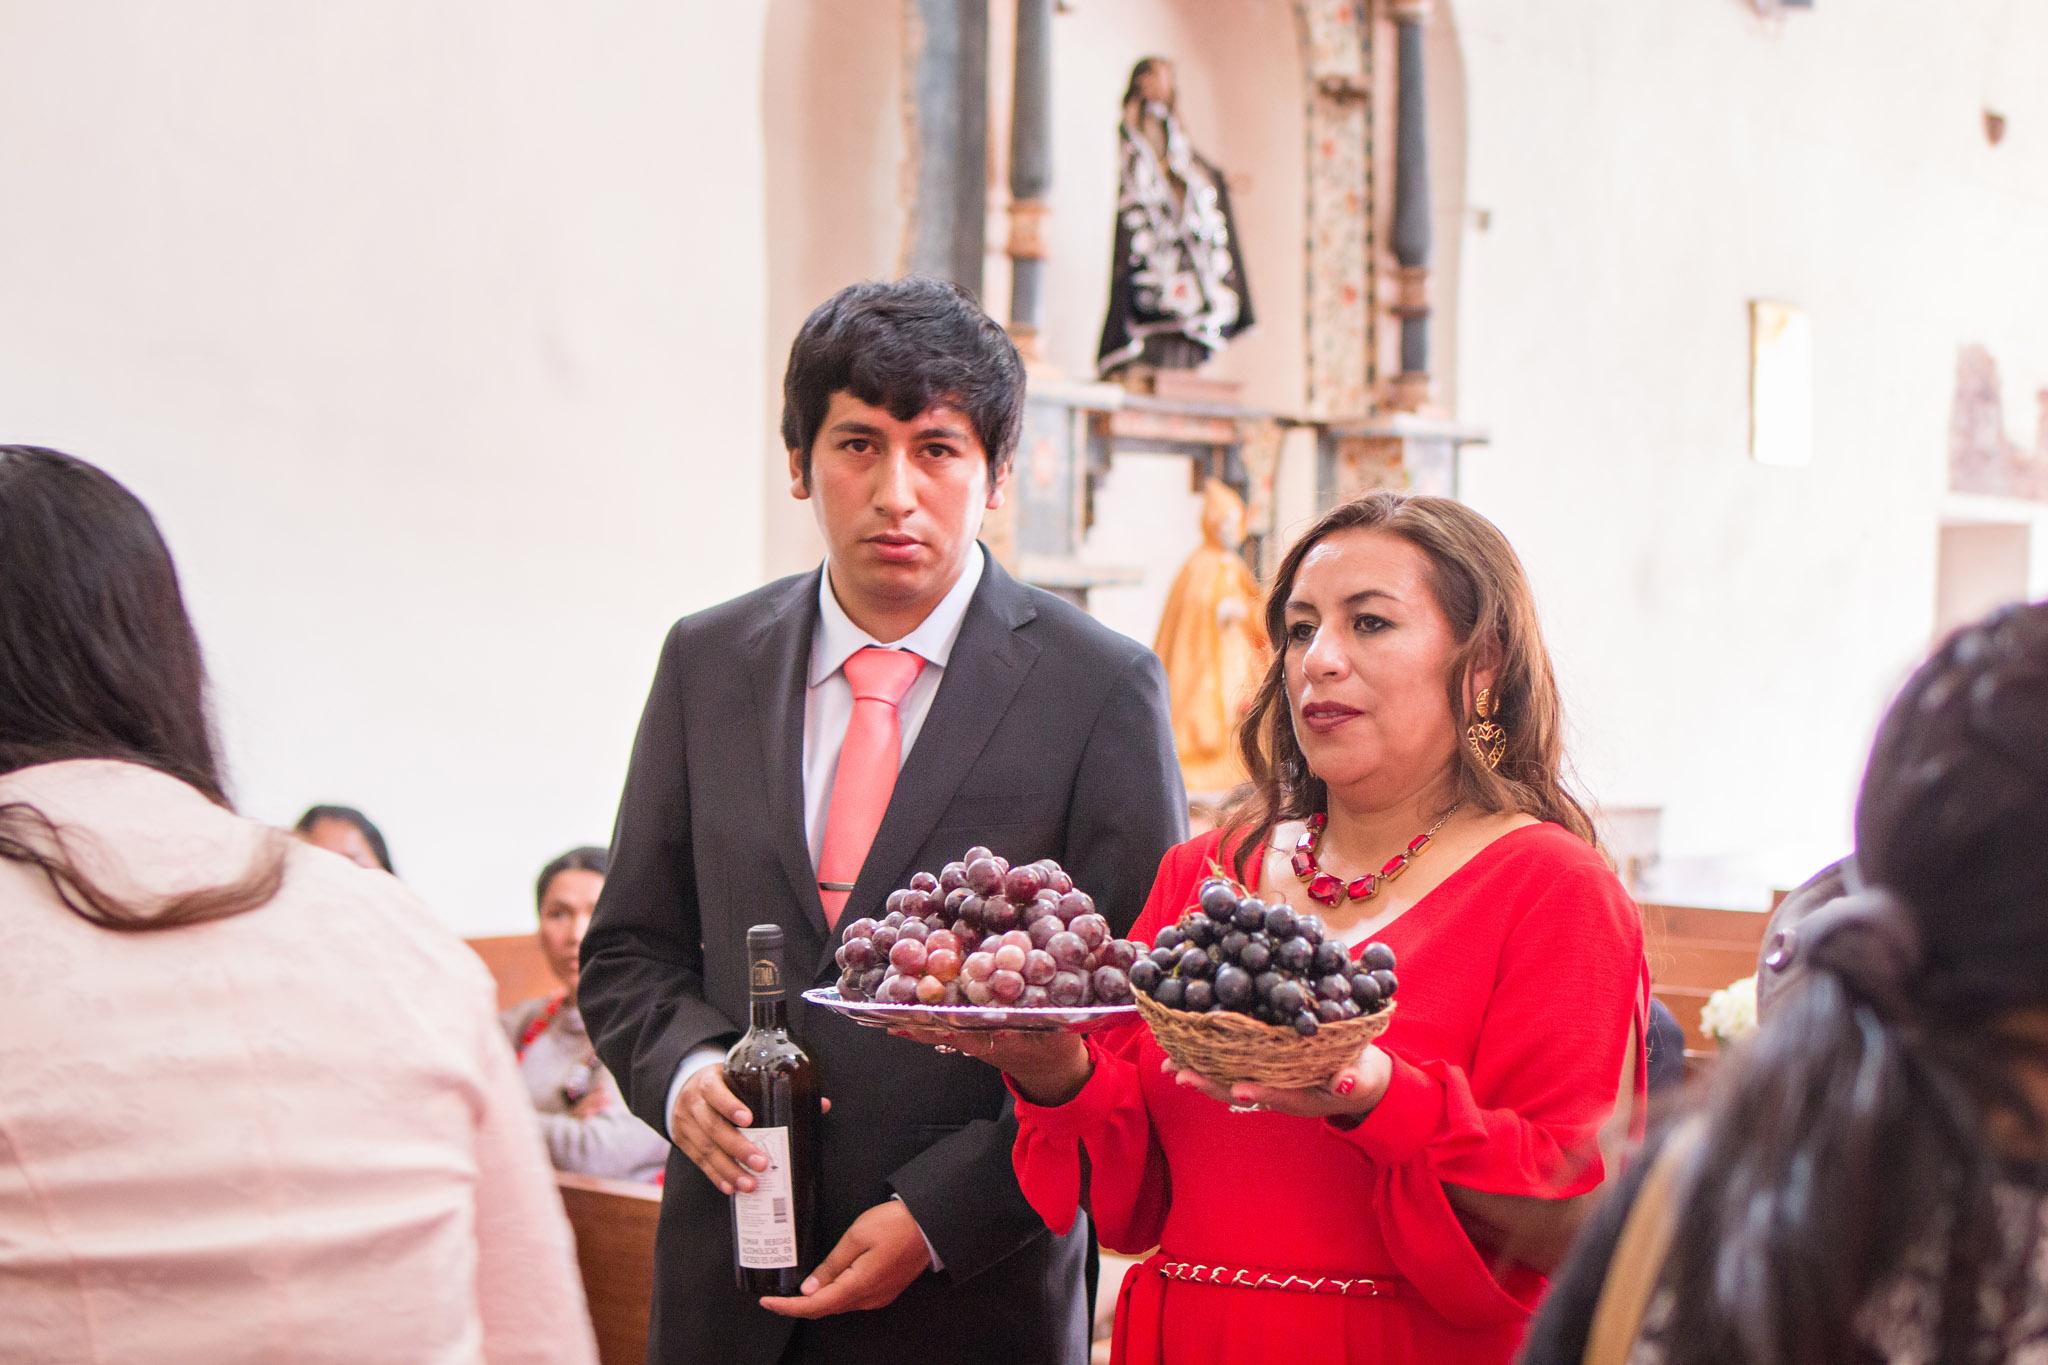 Wedding-Travellers-Destination-Wedding-Peru-Cusco-Hacienda-Sarapampa-Sacred-Valley-church-traditions-grapes-vine